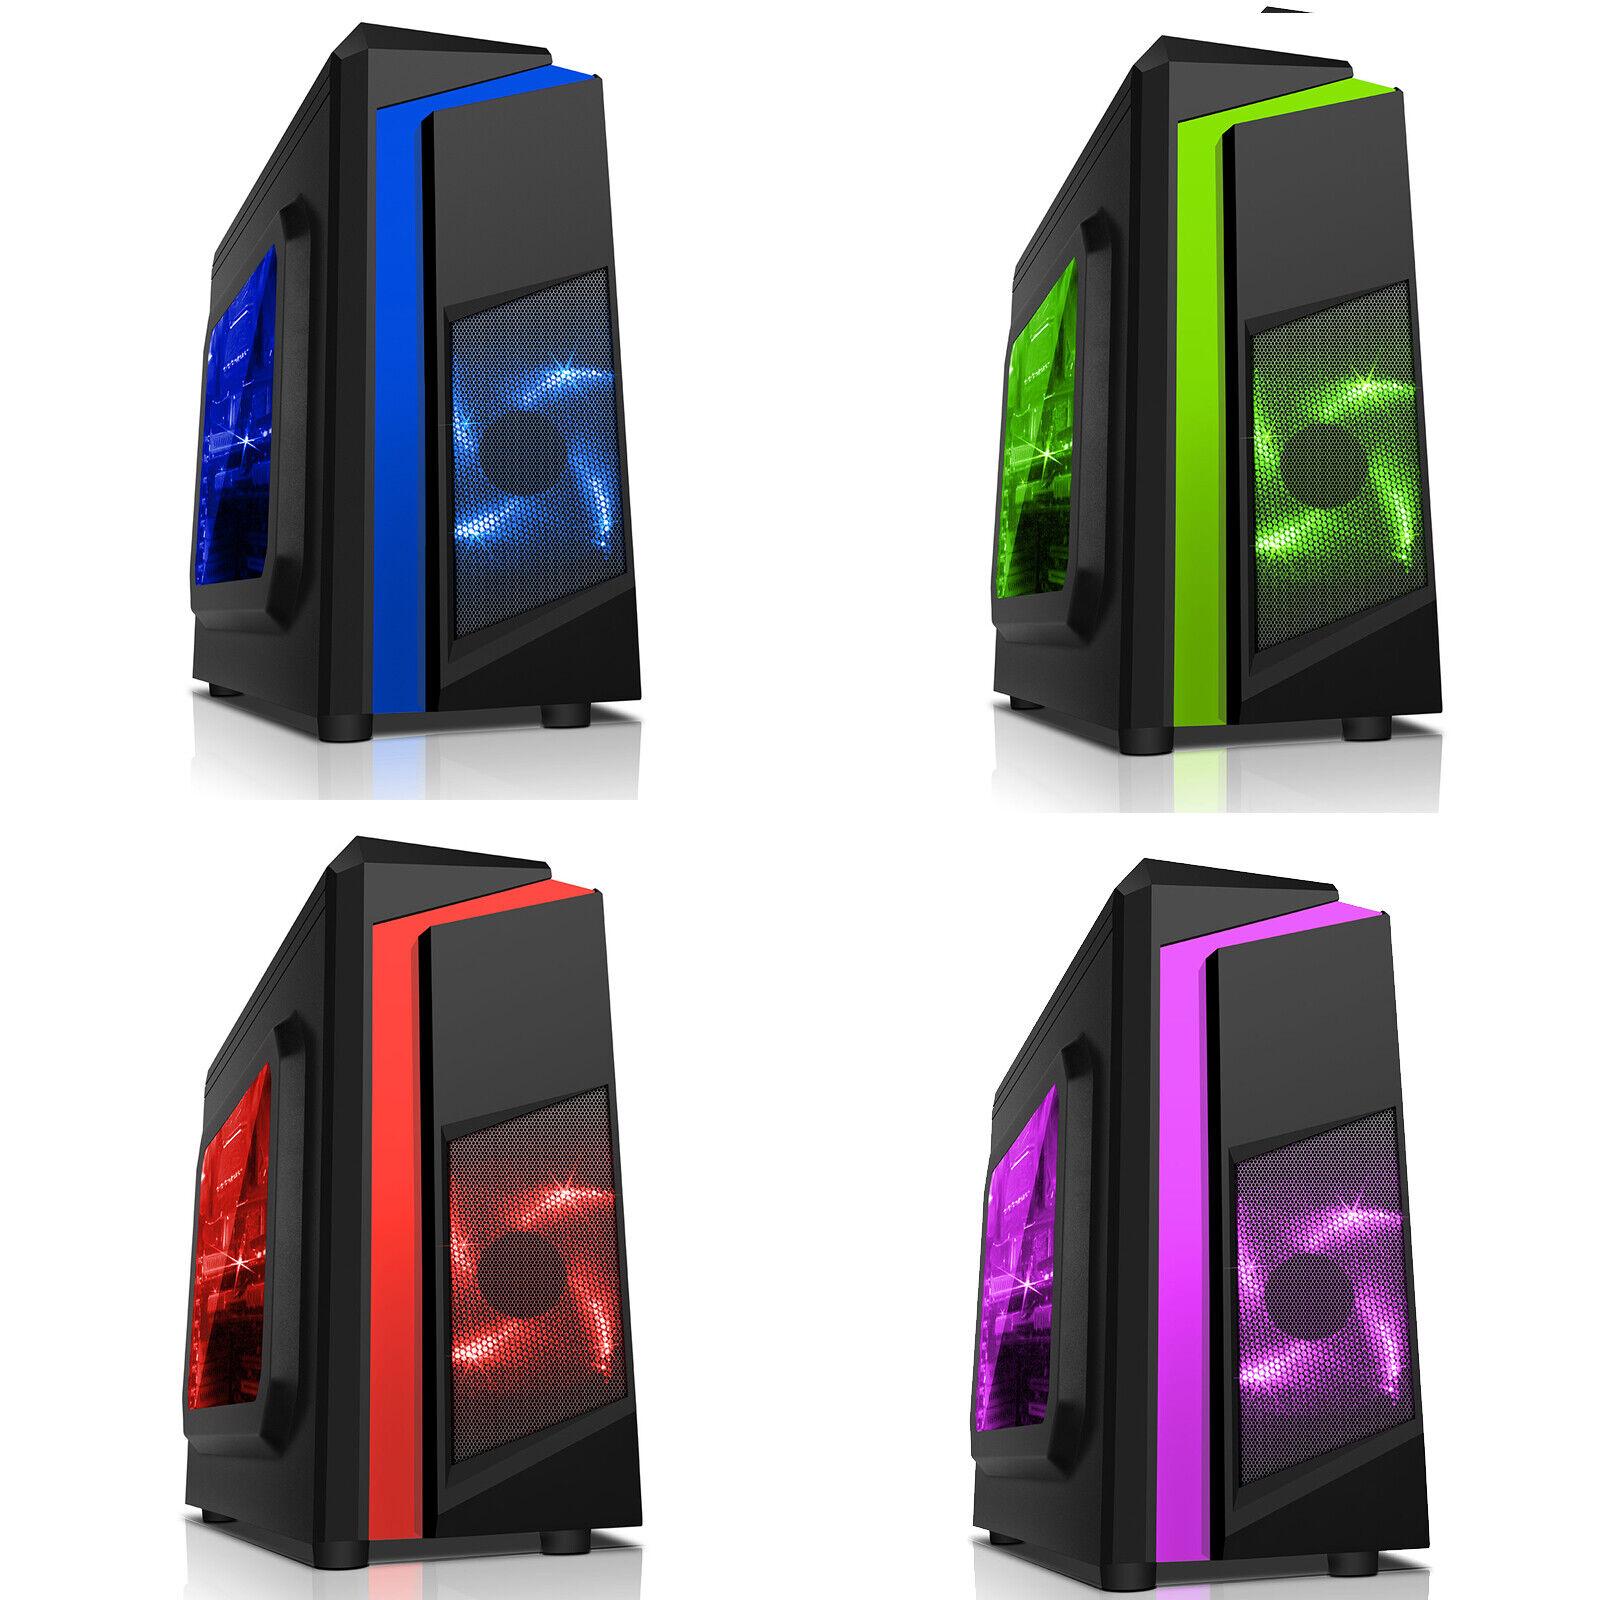 Computer Games - Fortnite AMD 2200G Quad Core 8GB 1TB Windows 10 Gaming PC Computer F3